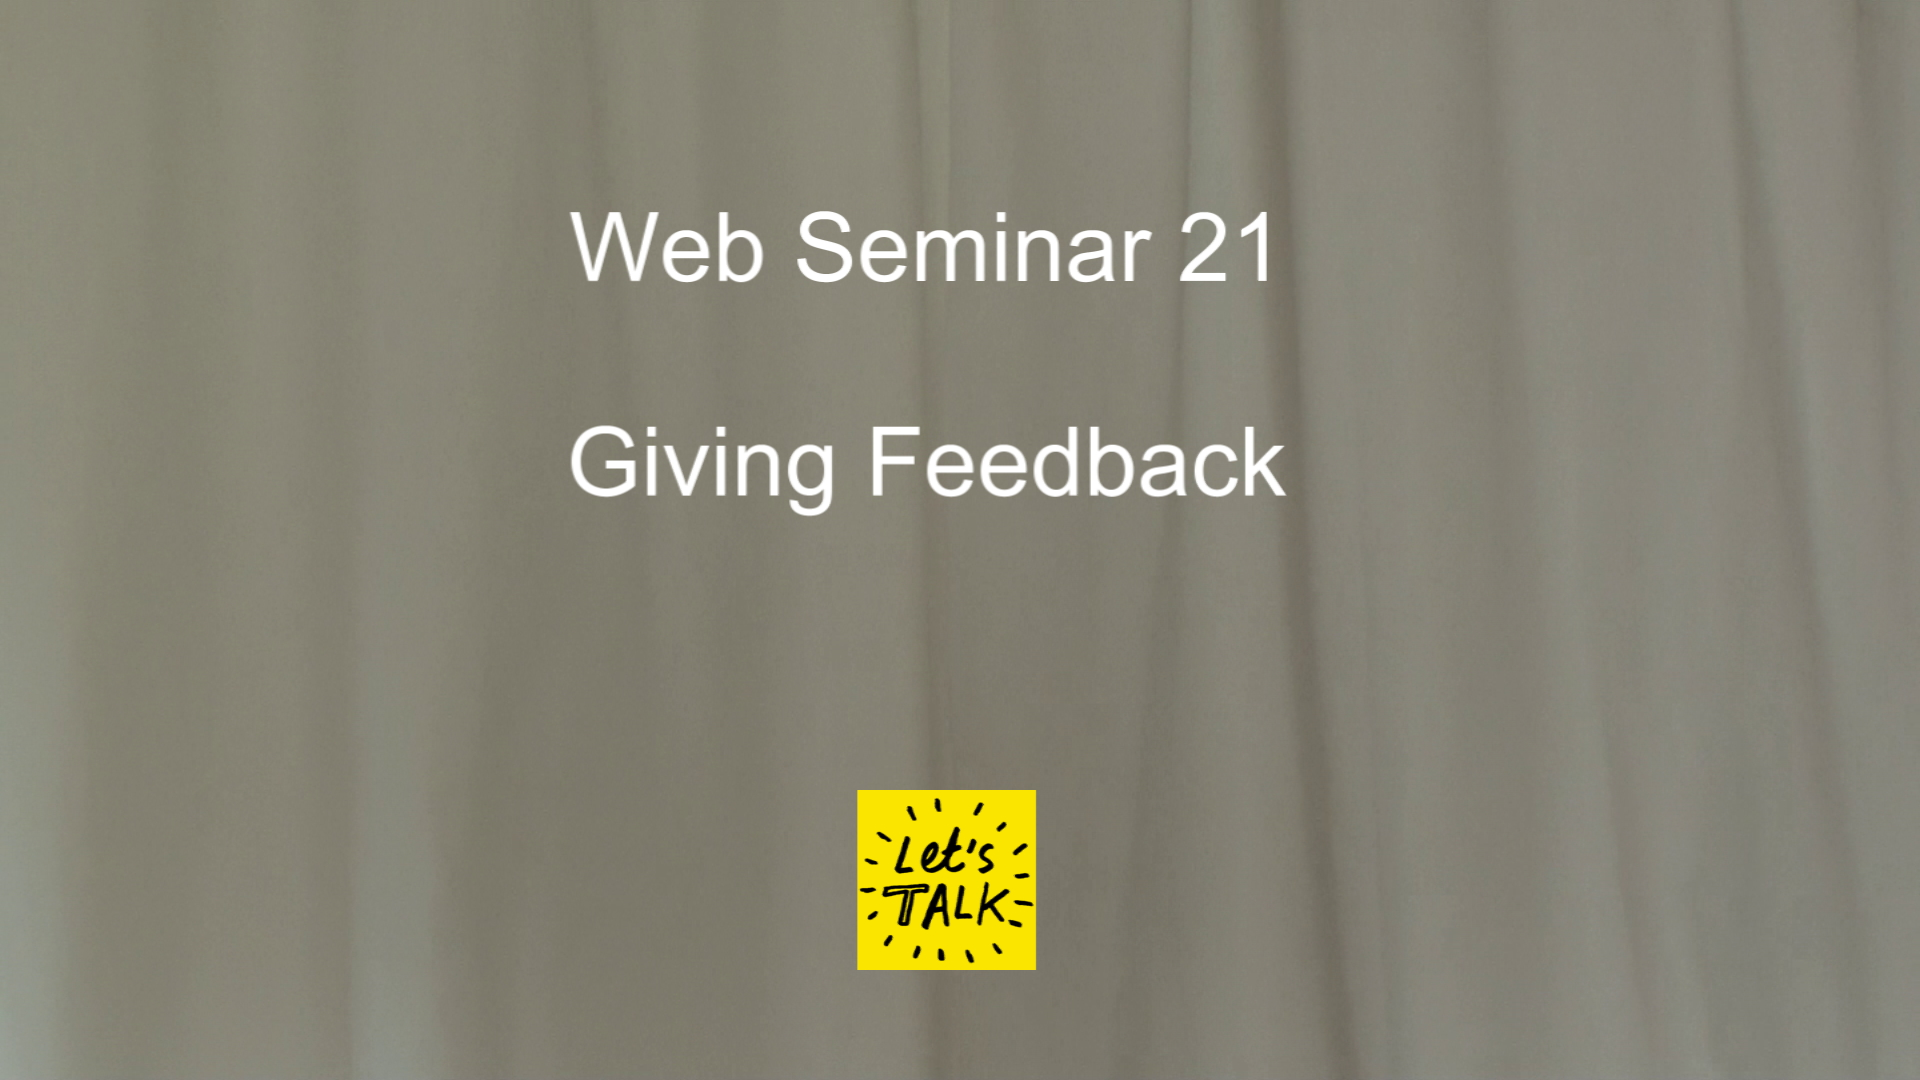 Web Seminar 21 - Giving Feedback